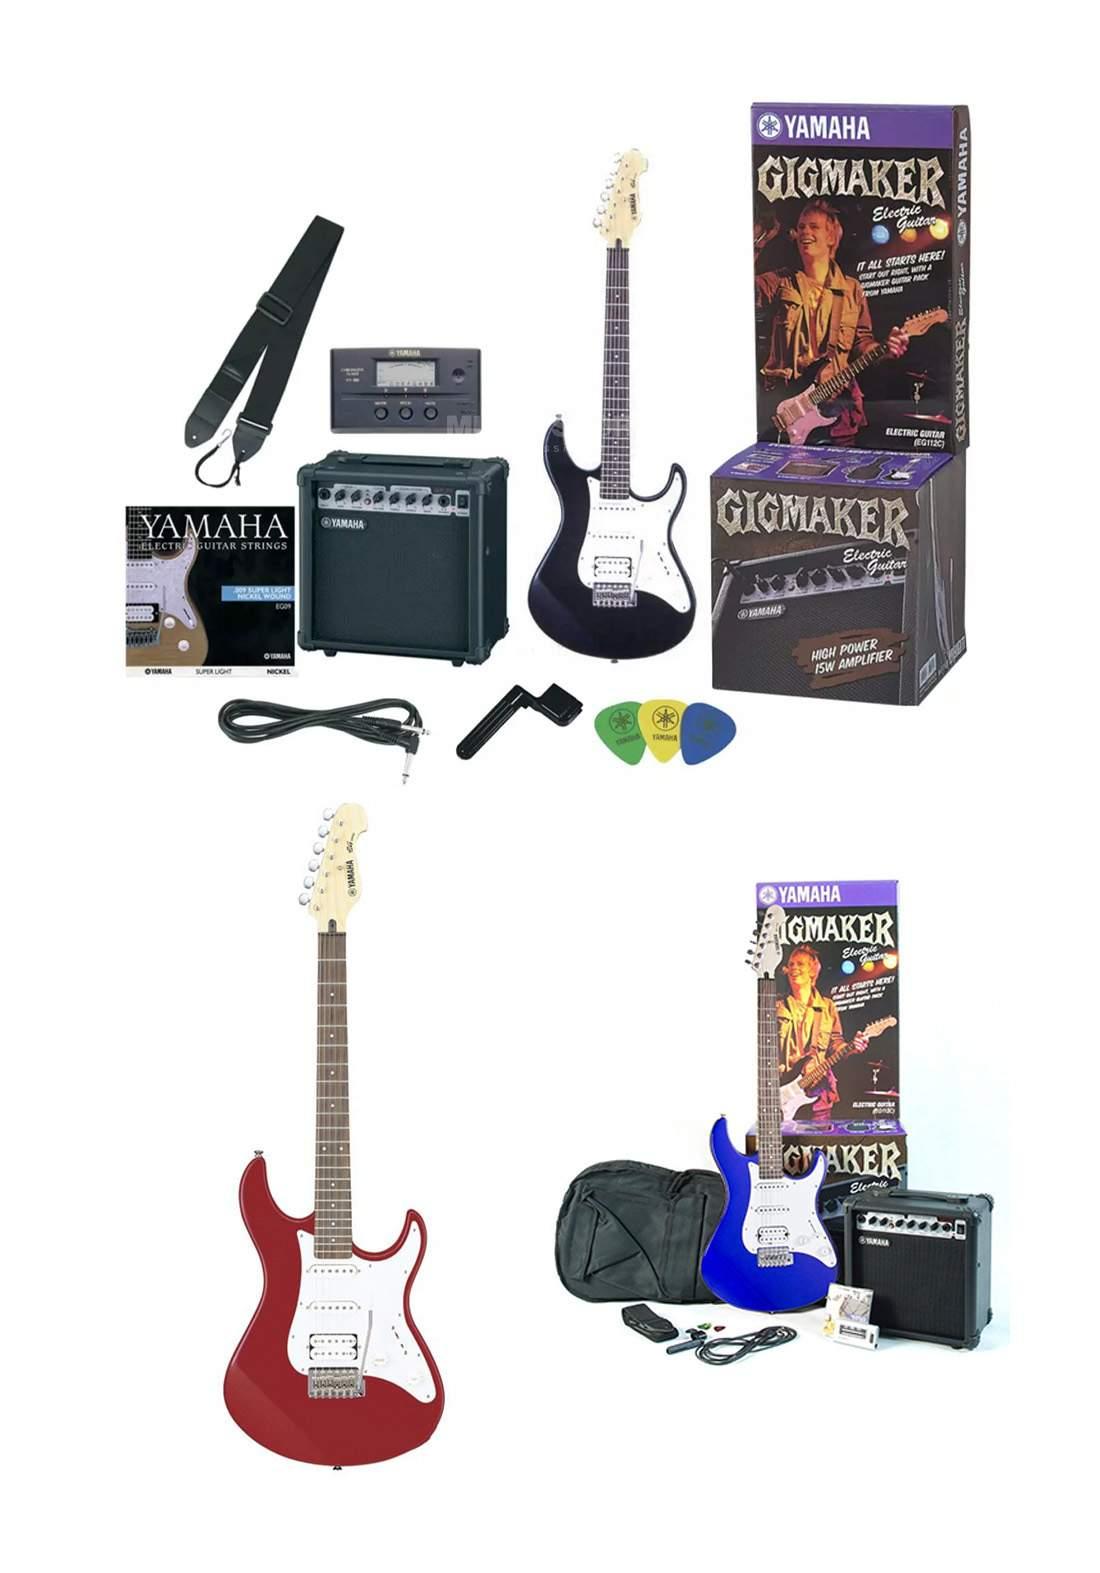 Yamaha Gigmaker Eg112 Electric Guitar جيتار كهربائي